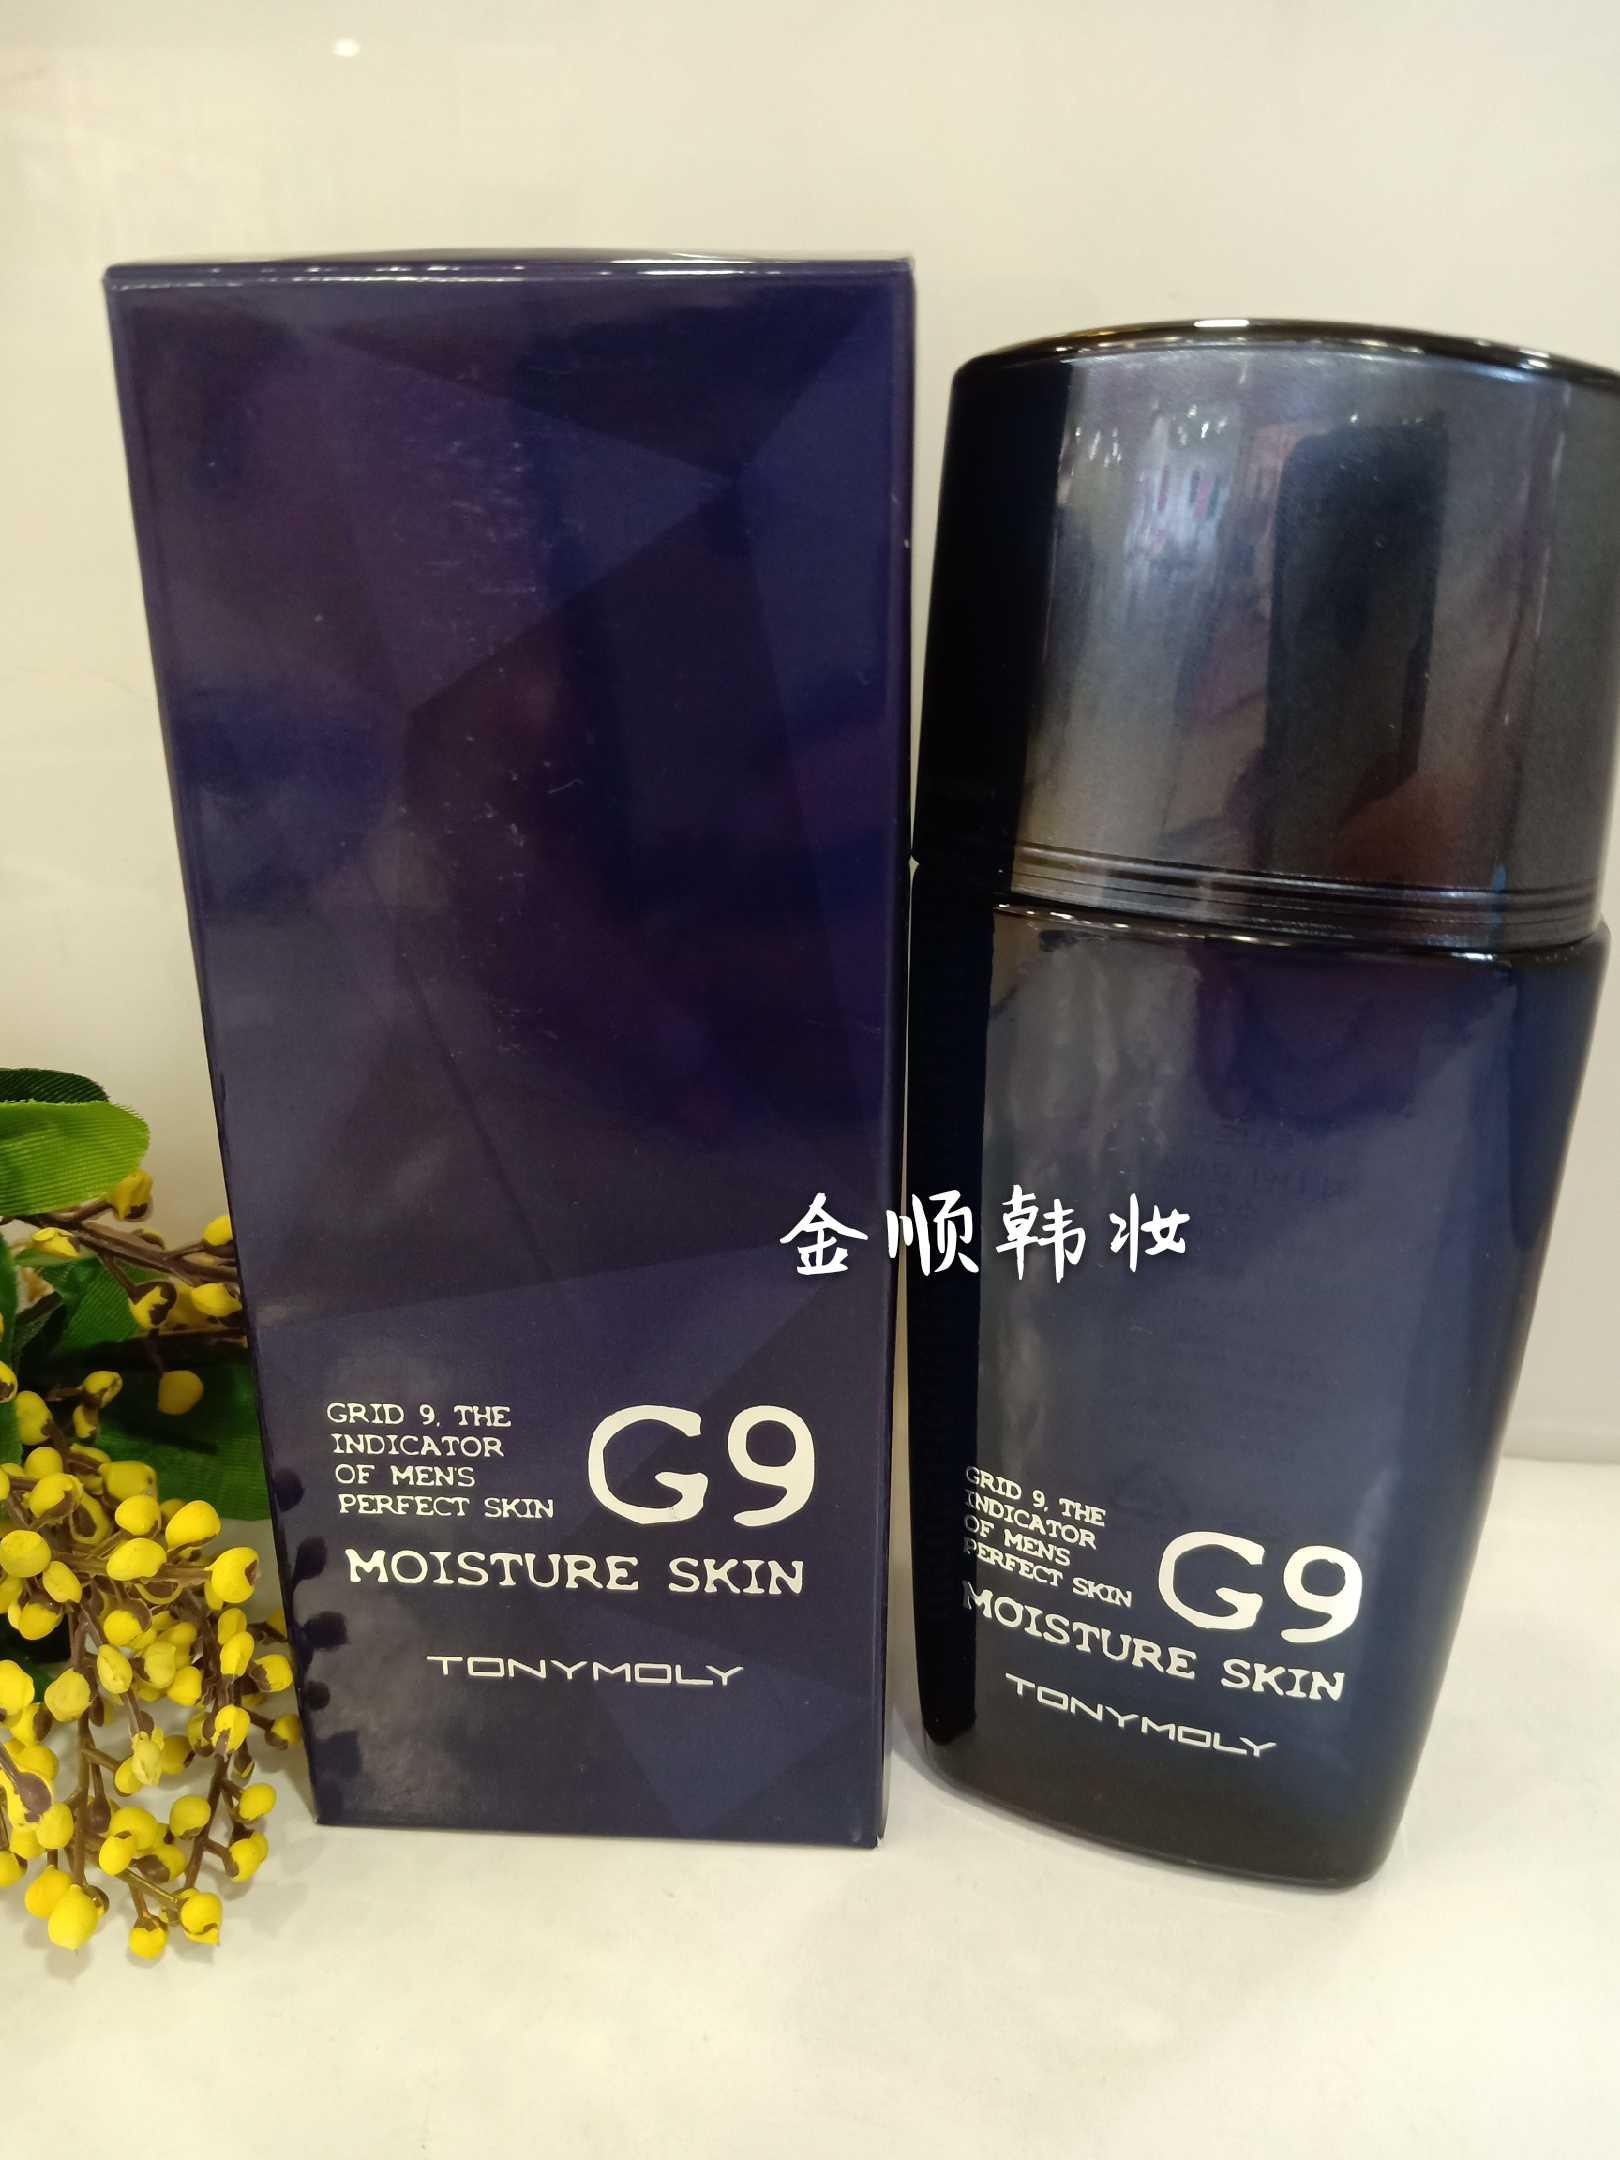 Tonymoly魔法森林托尼魅力G9男士护肤水保湿水130ml